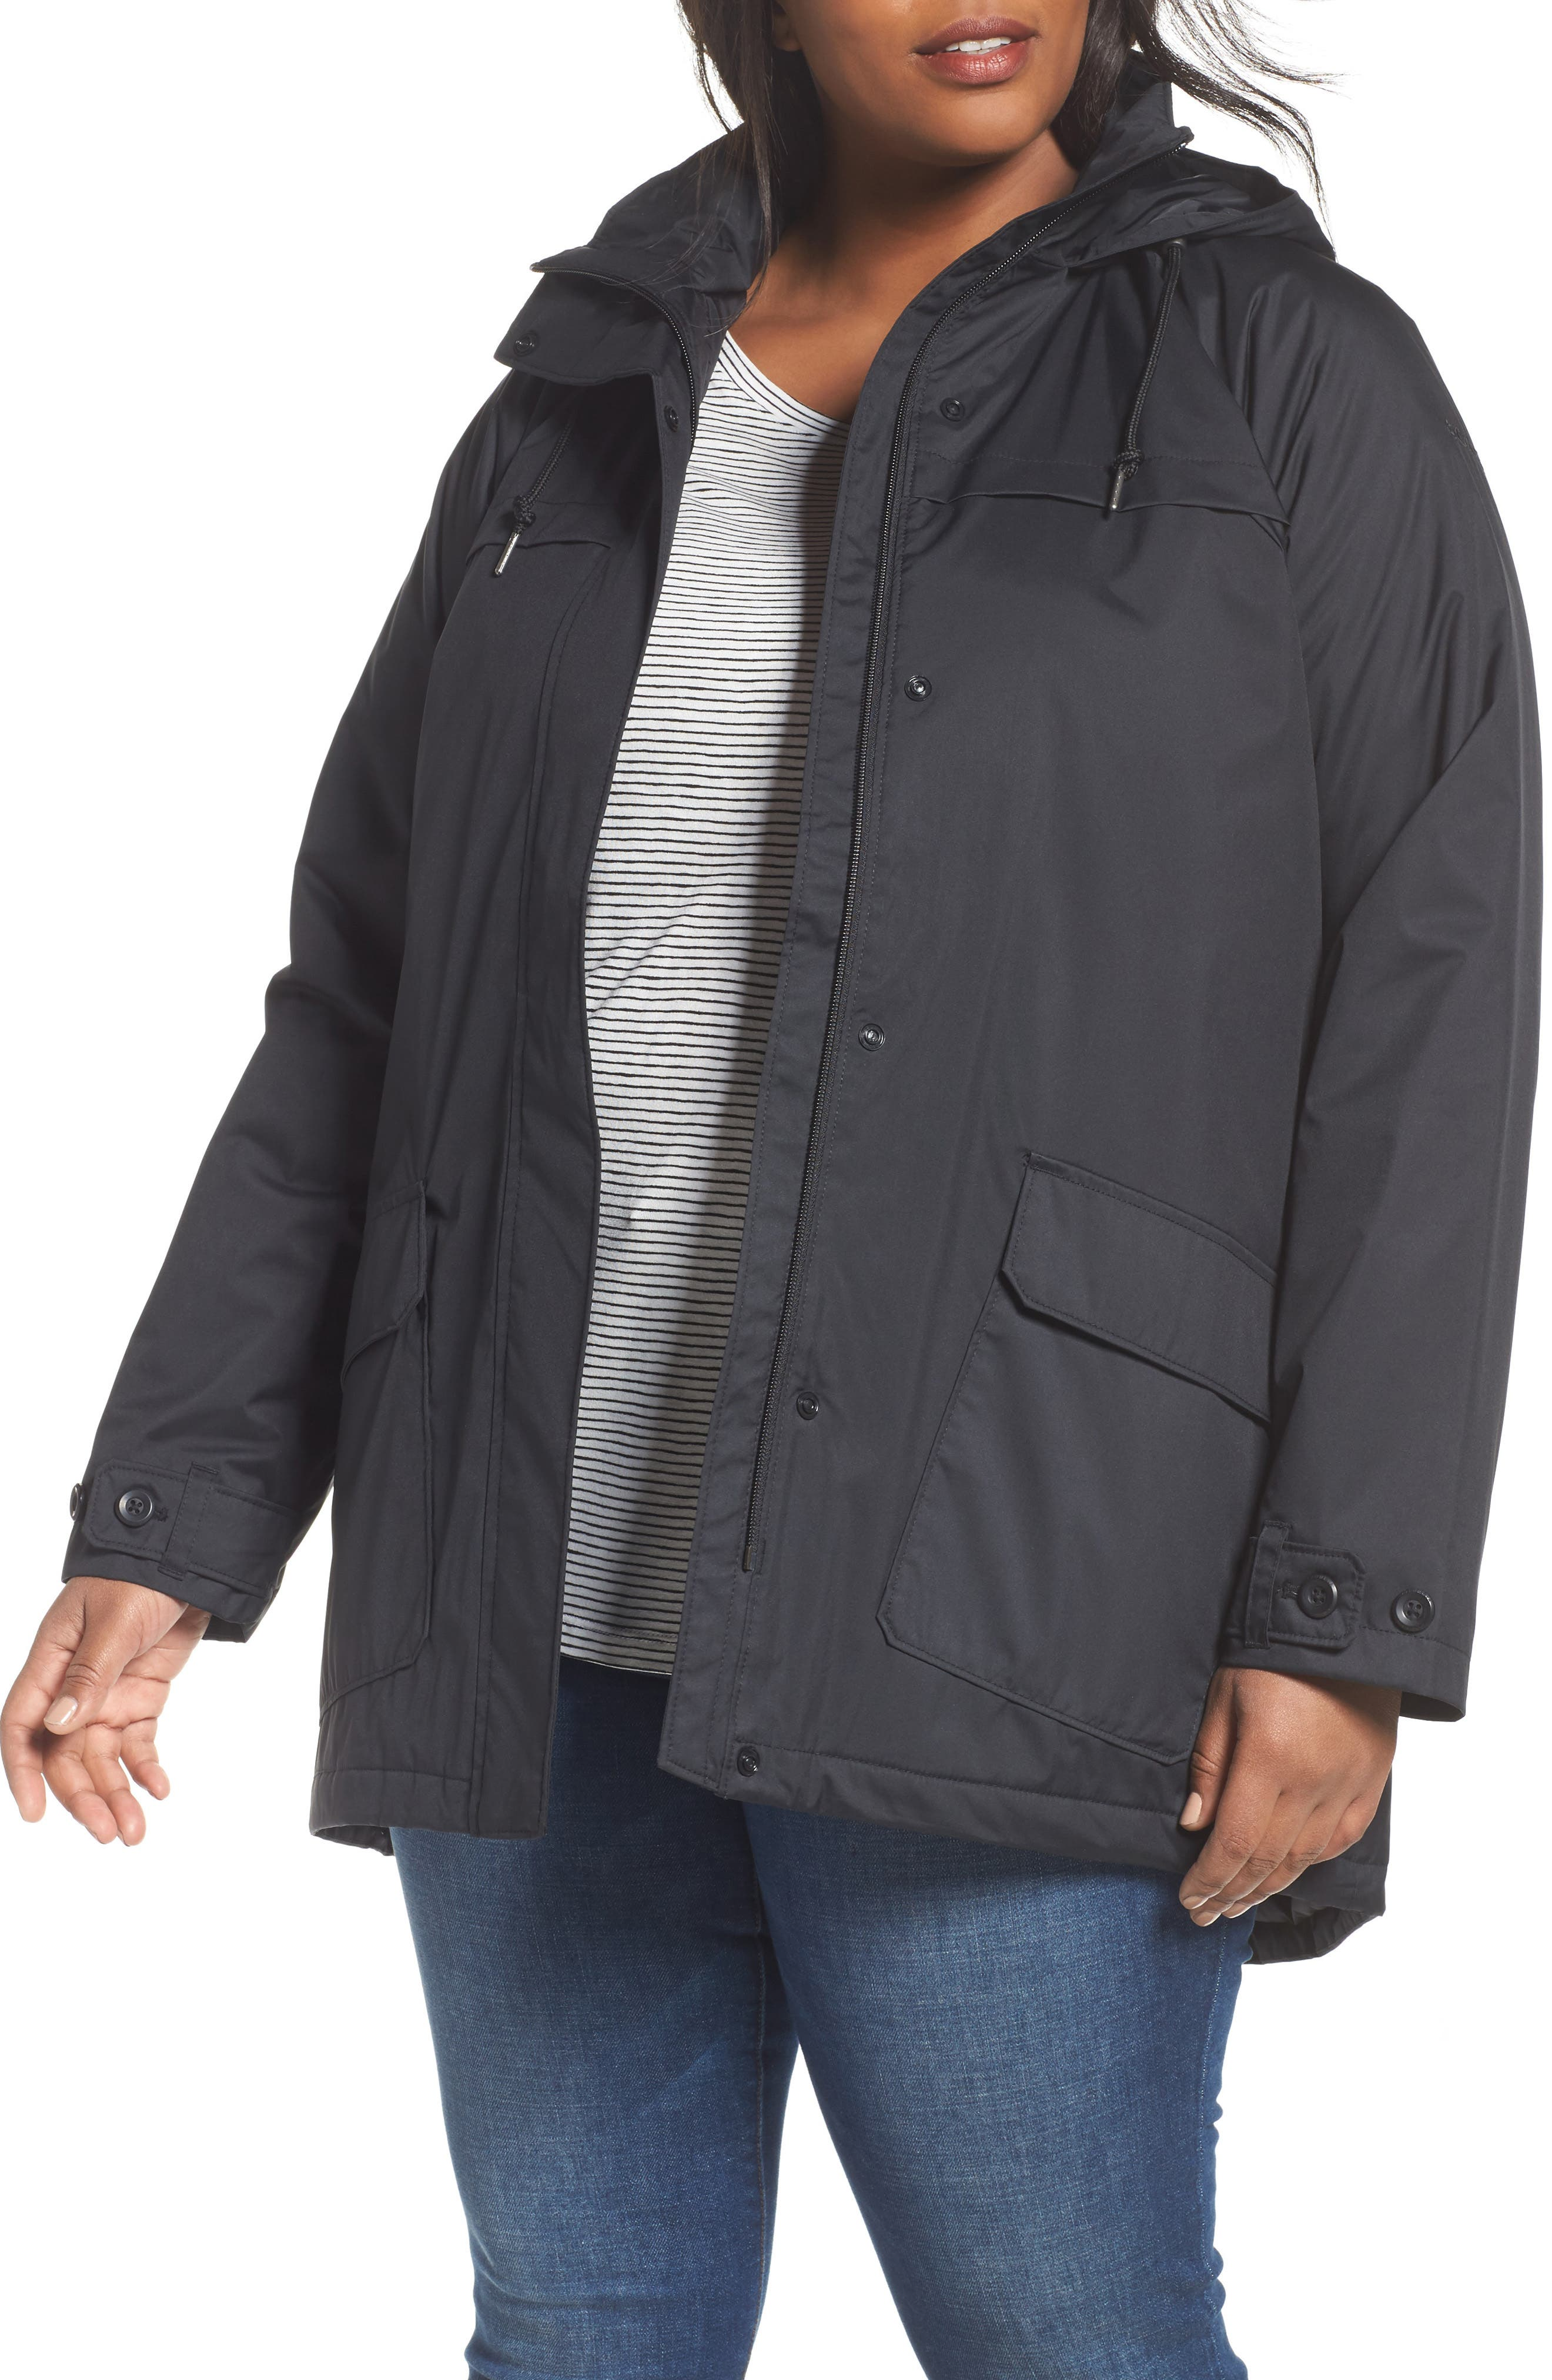 Lookout Crest Omni-Tech Waterproof Jacket,                         Main,                         color, Black